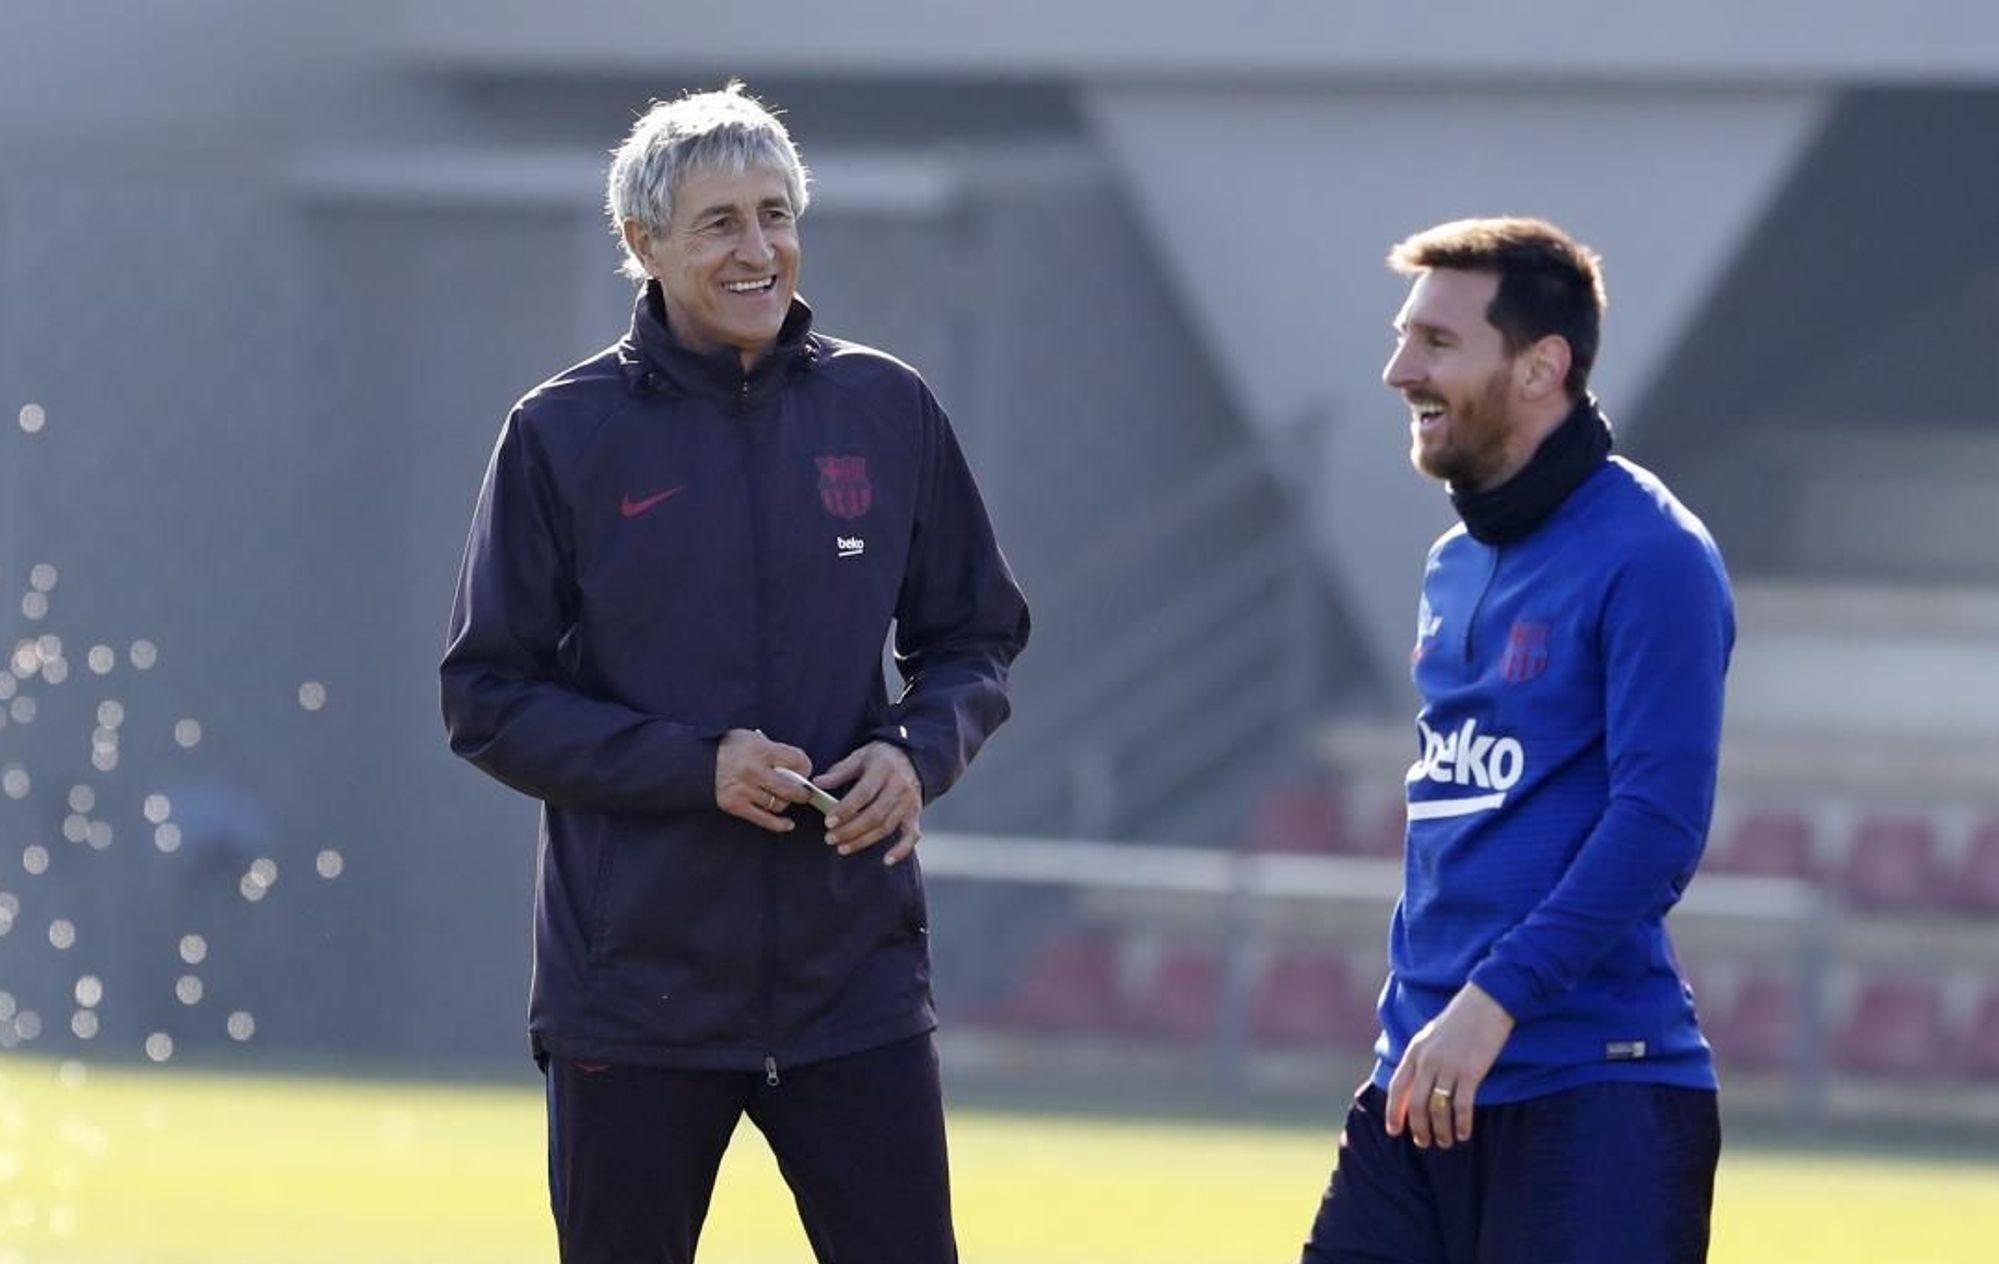 Quique Setién talks about managing Lionel Messi at Barcelona ...